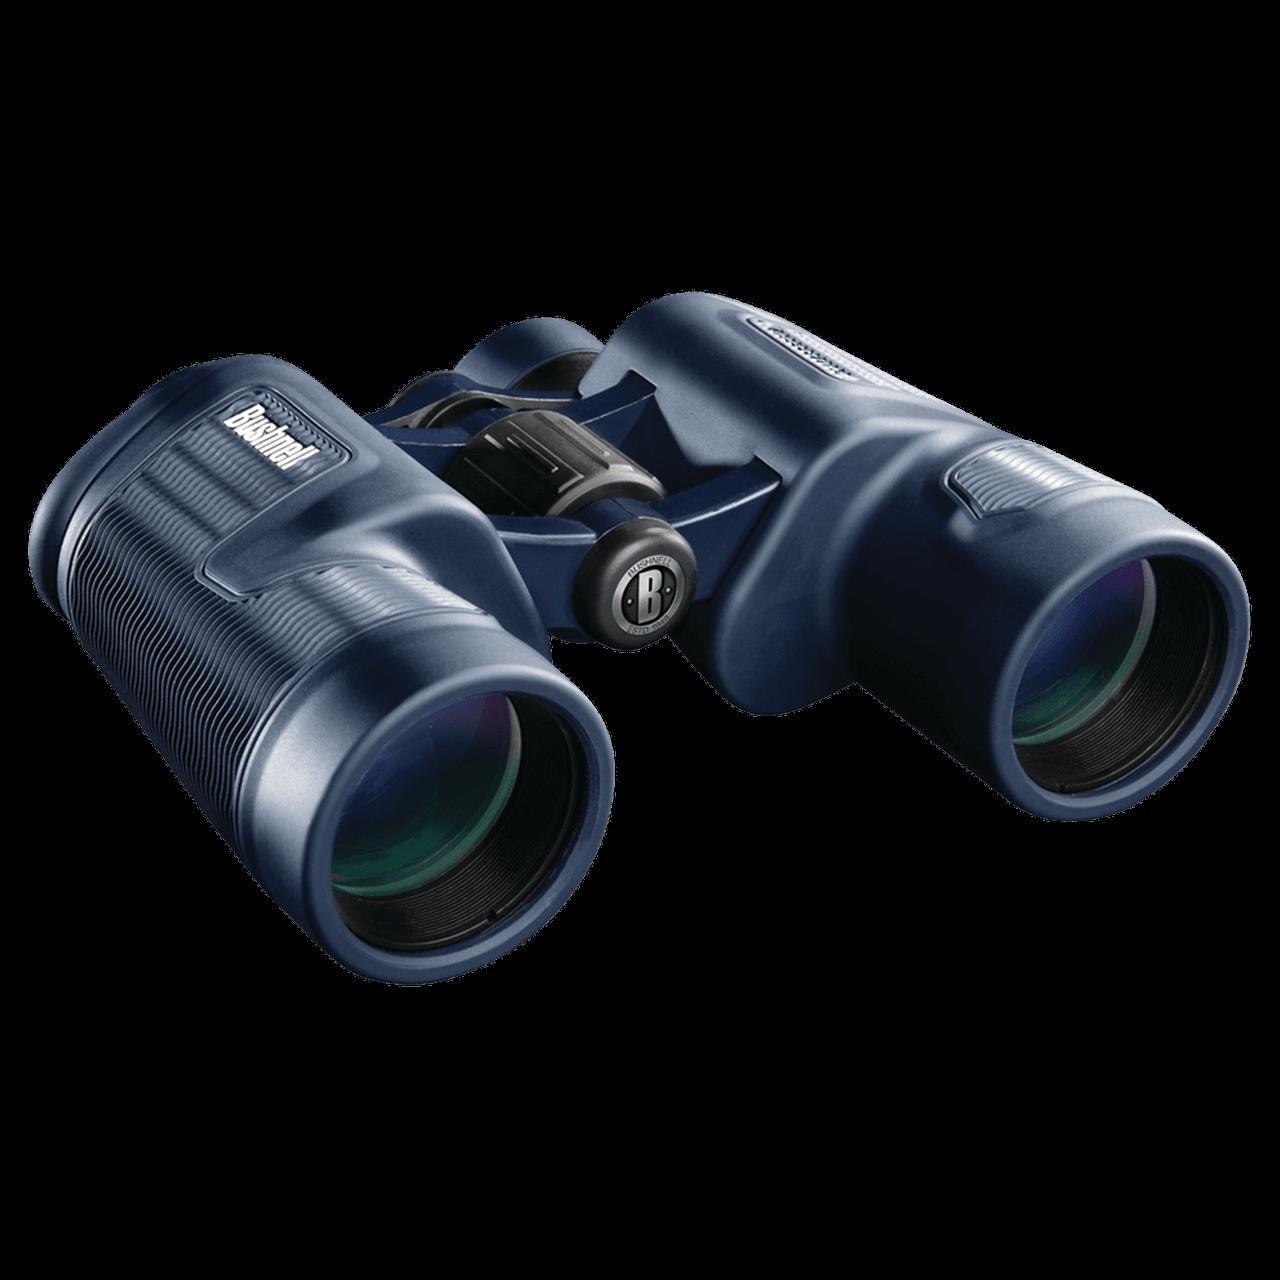 Bushnell H20 Binoculars 8x42 Porro